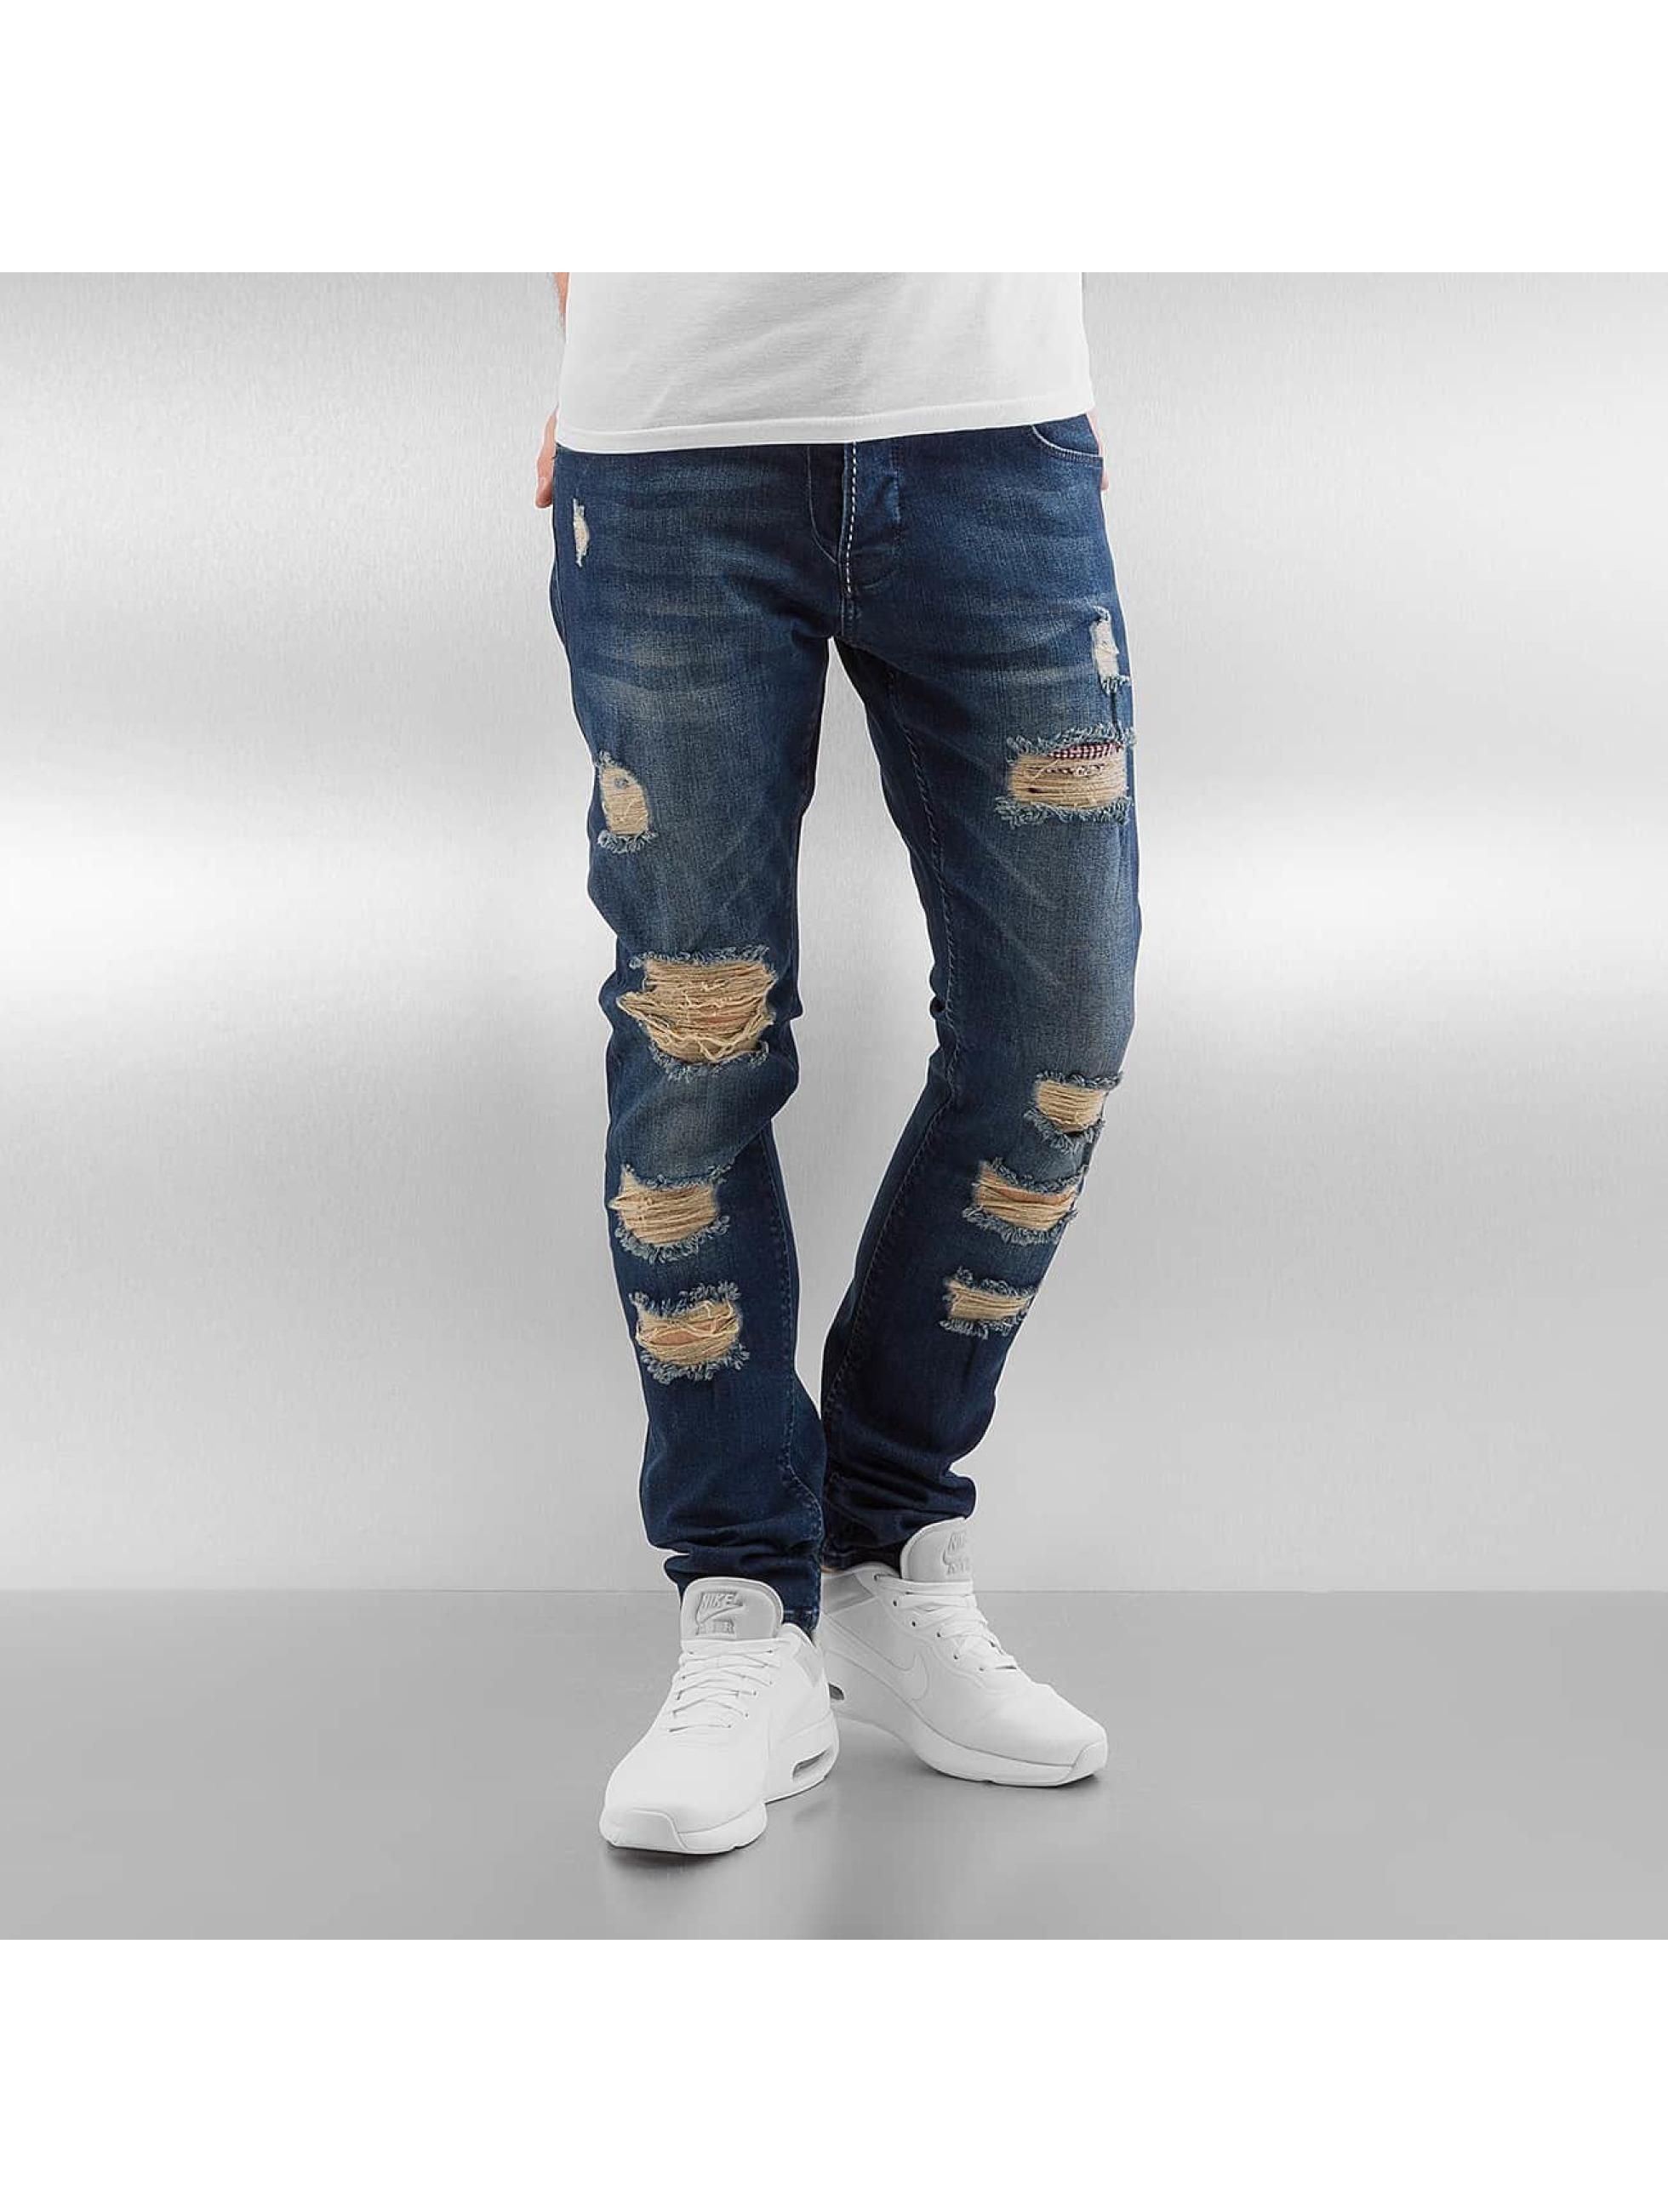 Skinny Jeans Grover in blau